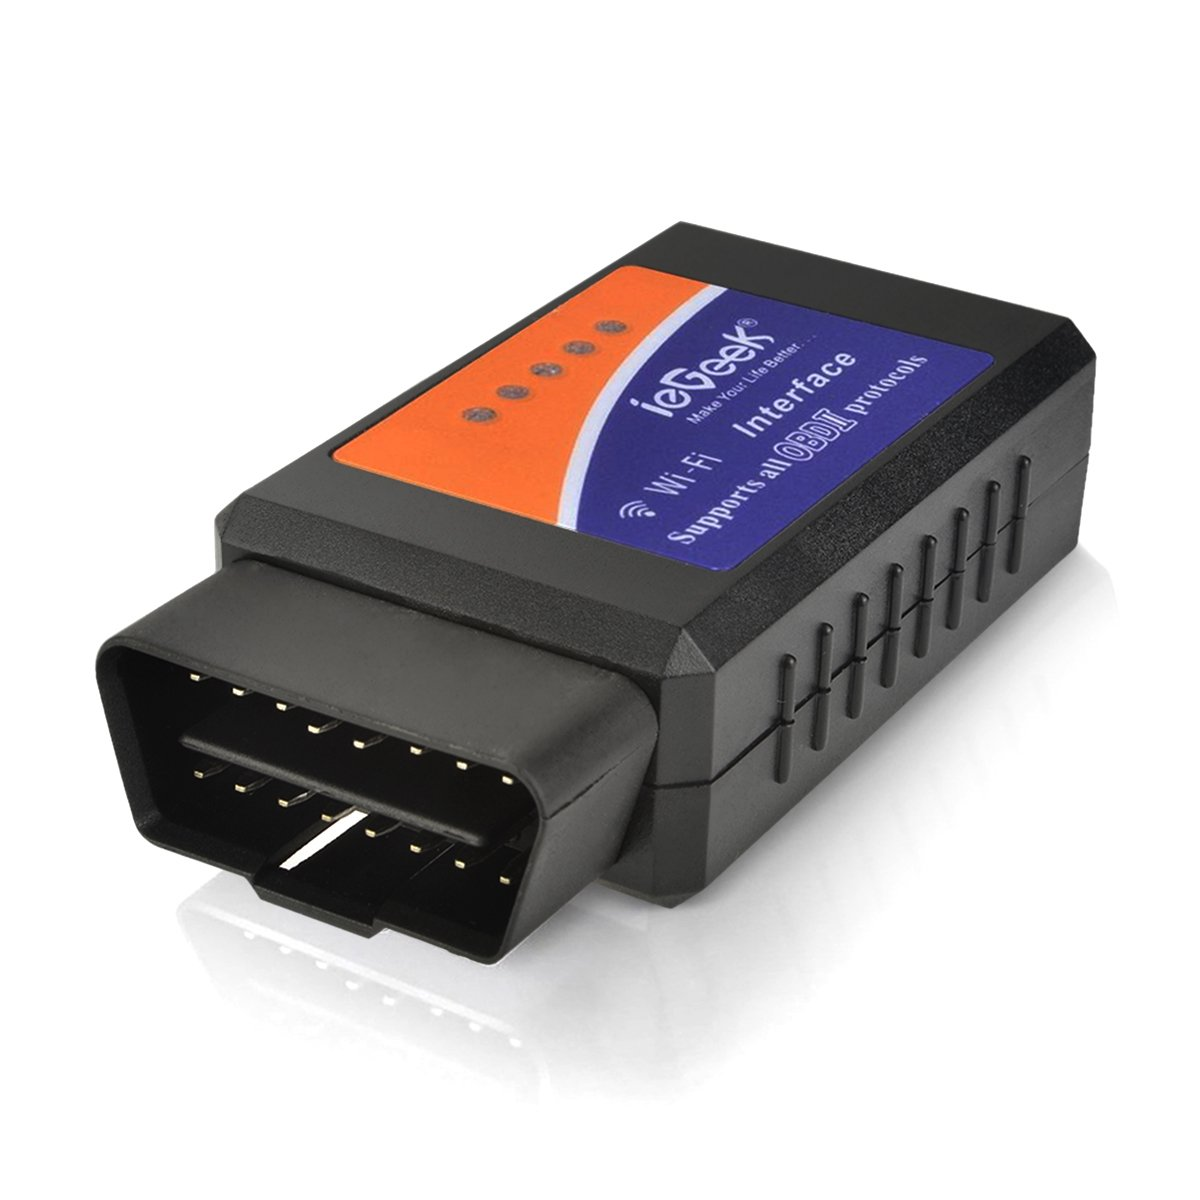 Iegeek Obd Wifi Obd2 Mini Adaptateur Sans Fil Scanner Code De D Faut